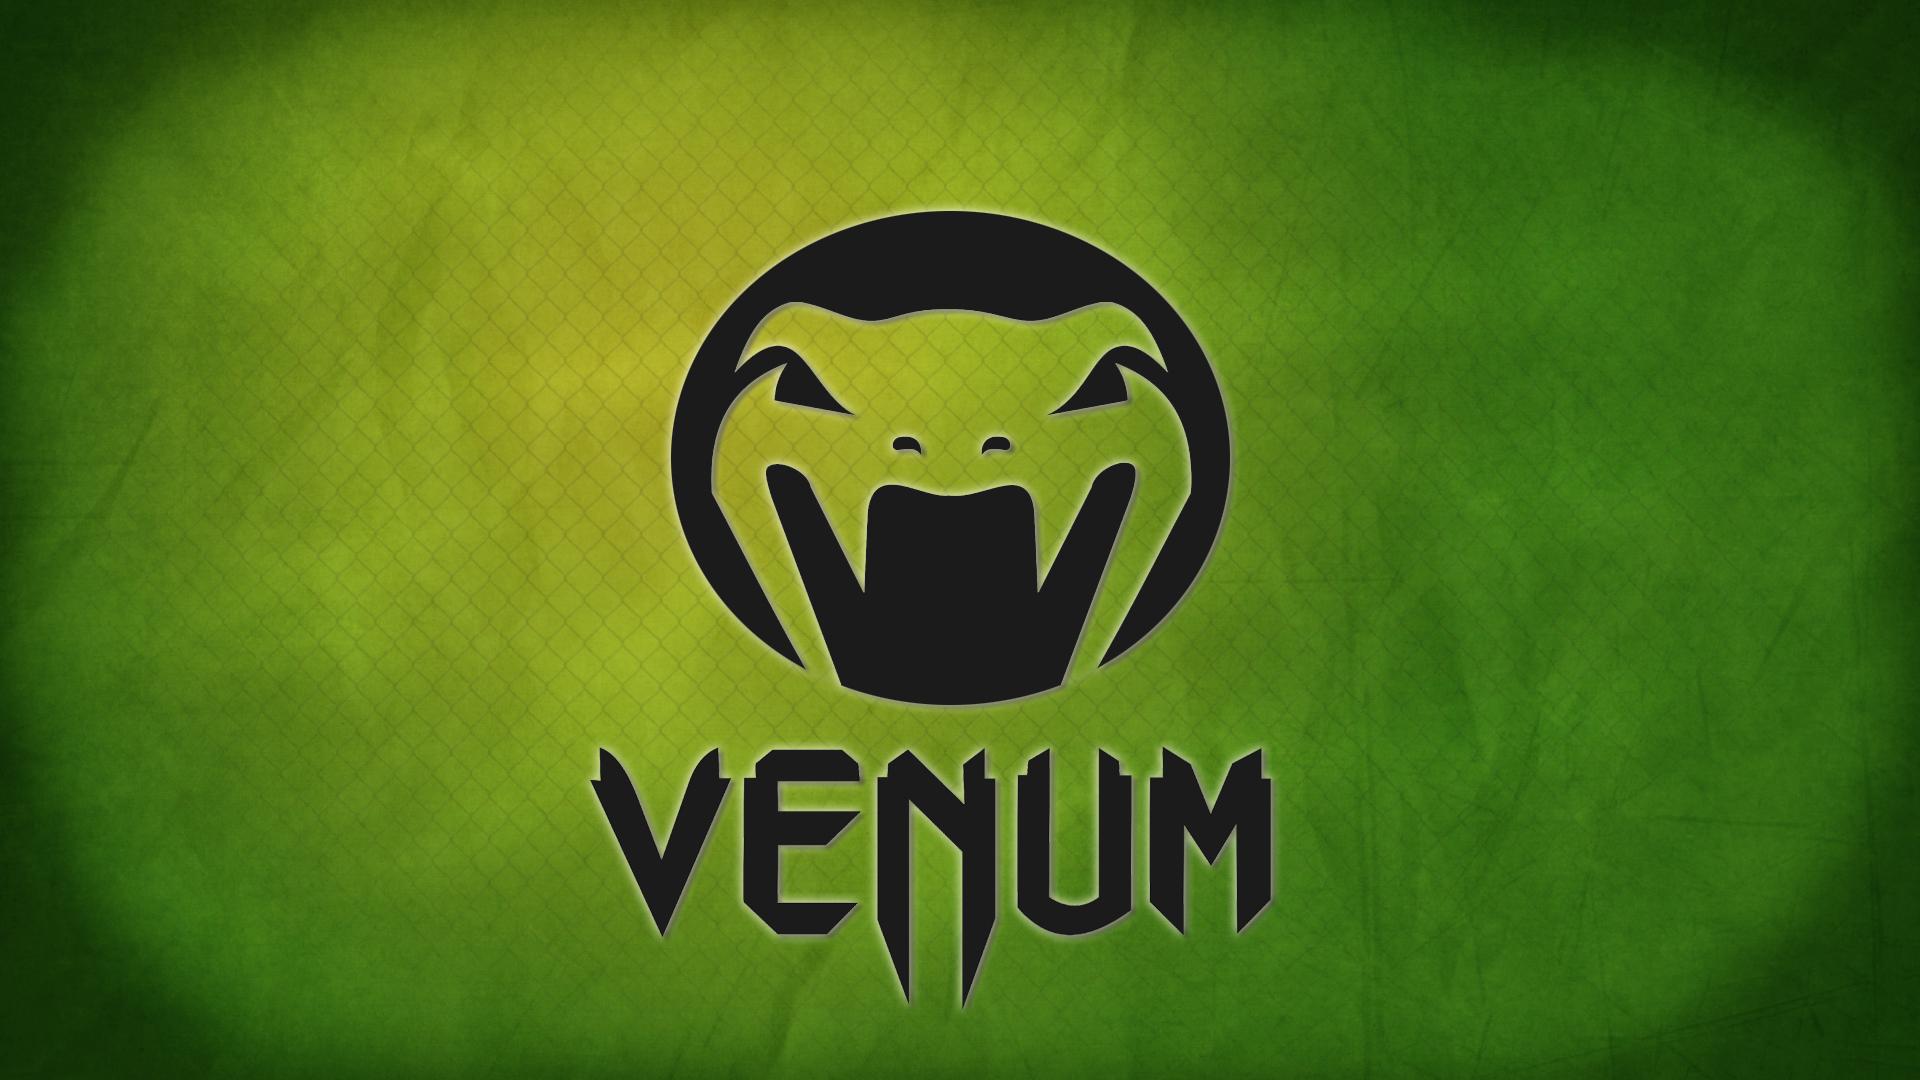 Ekipirovka ufc mma logo fights venum 2012 wallpaper   ForWallpaper 1920x1080